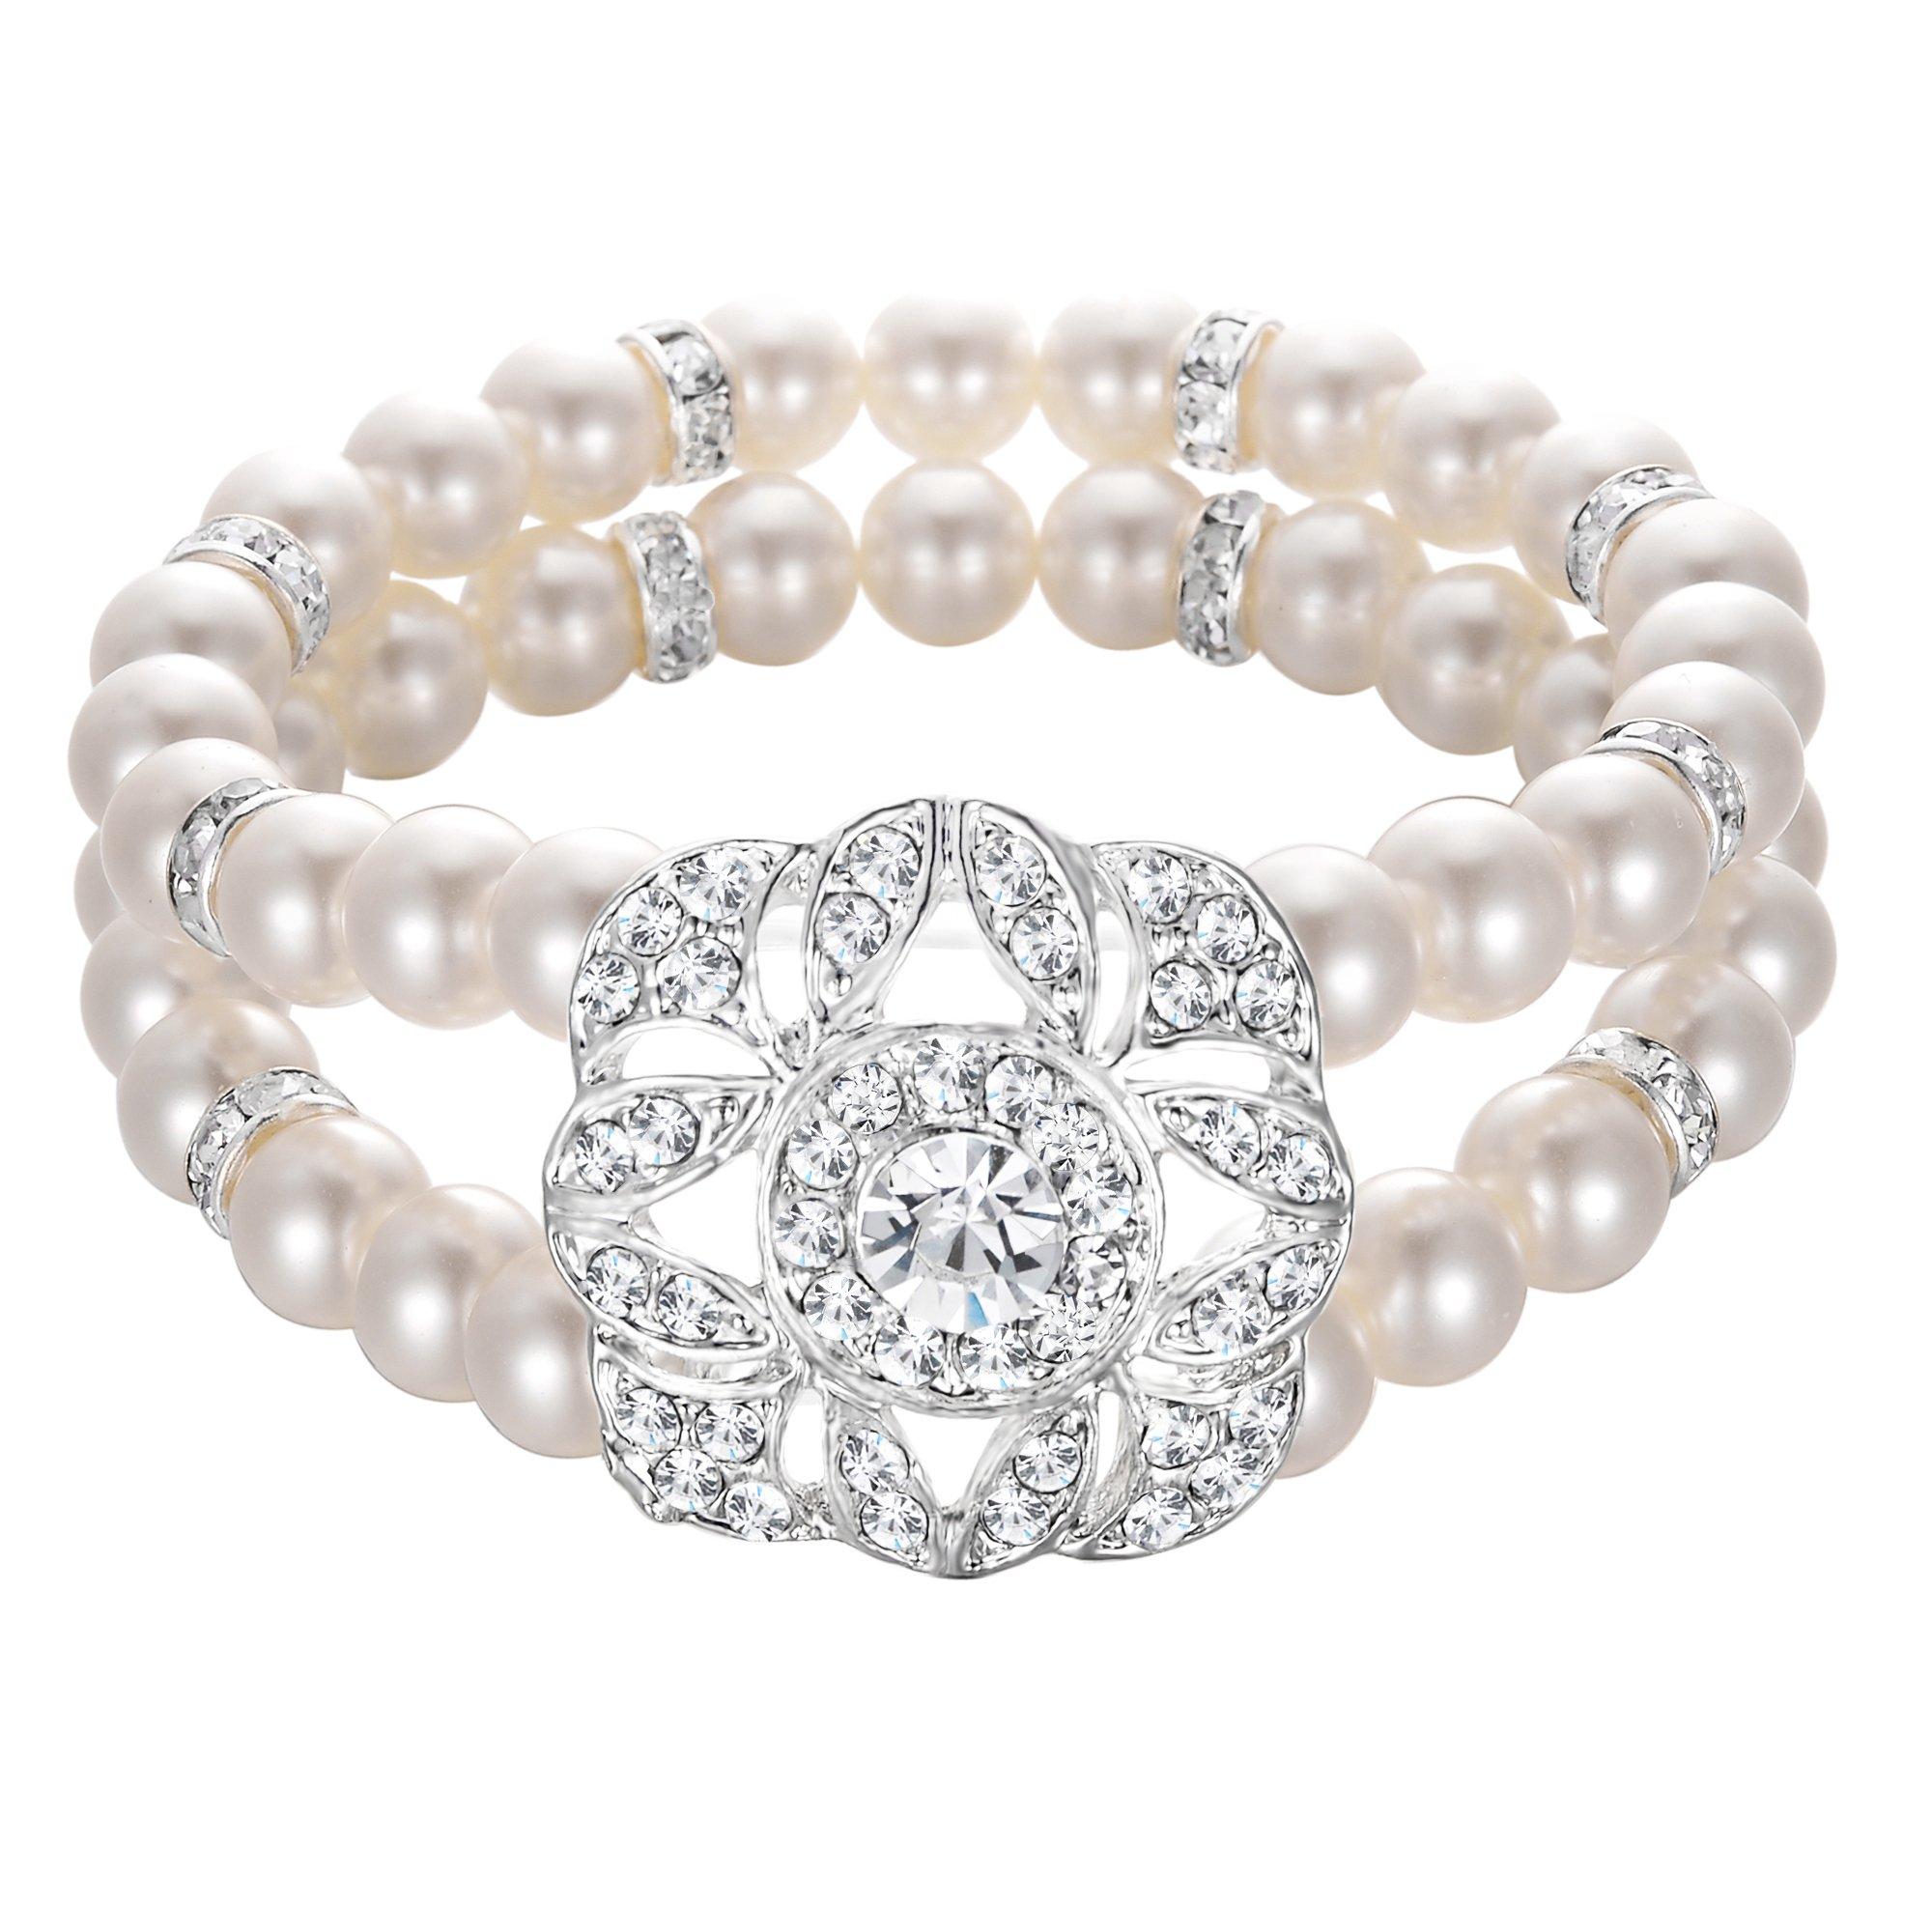 BriLove Women's Wedding Bridal Bracelet, Simulated Pearl Crystal Double Row Strand Floral Leaf Vintage Stretch Bracelet Clear Silver-Tone Ivory Color